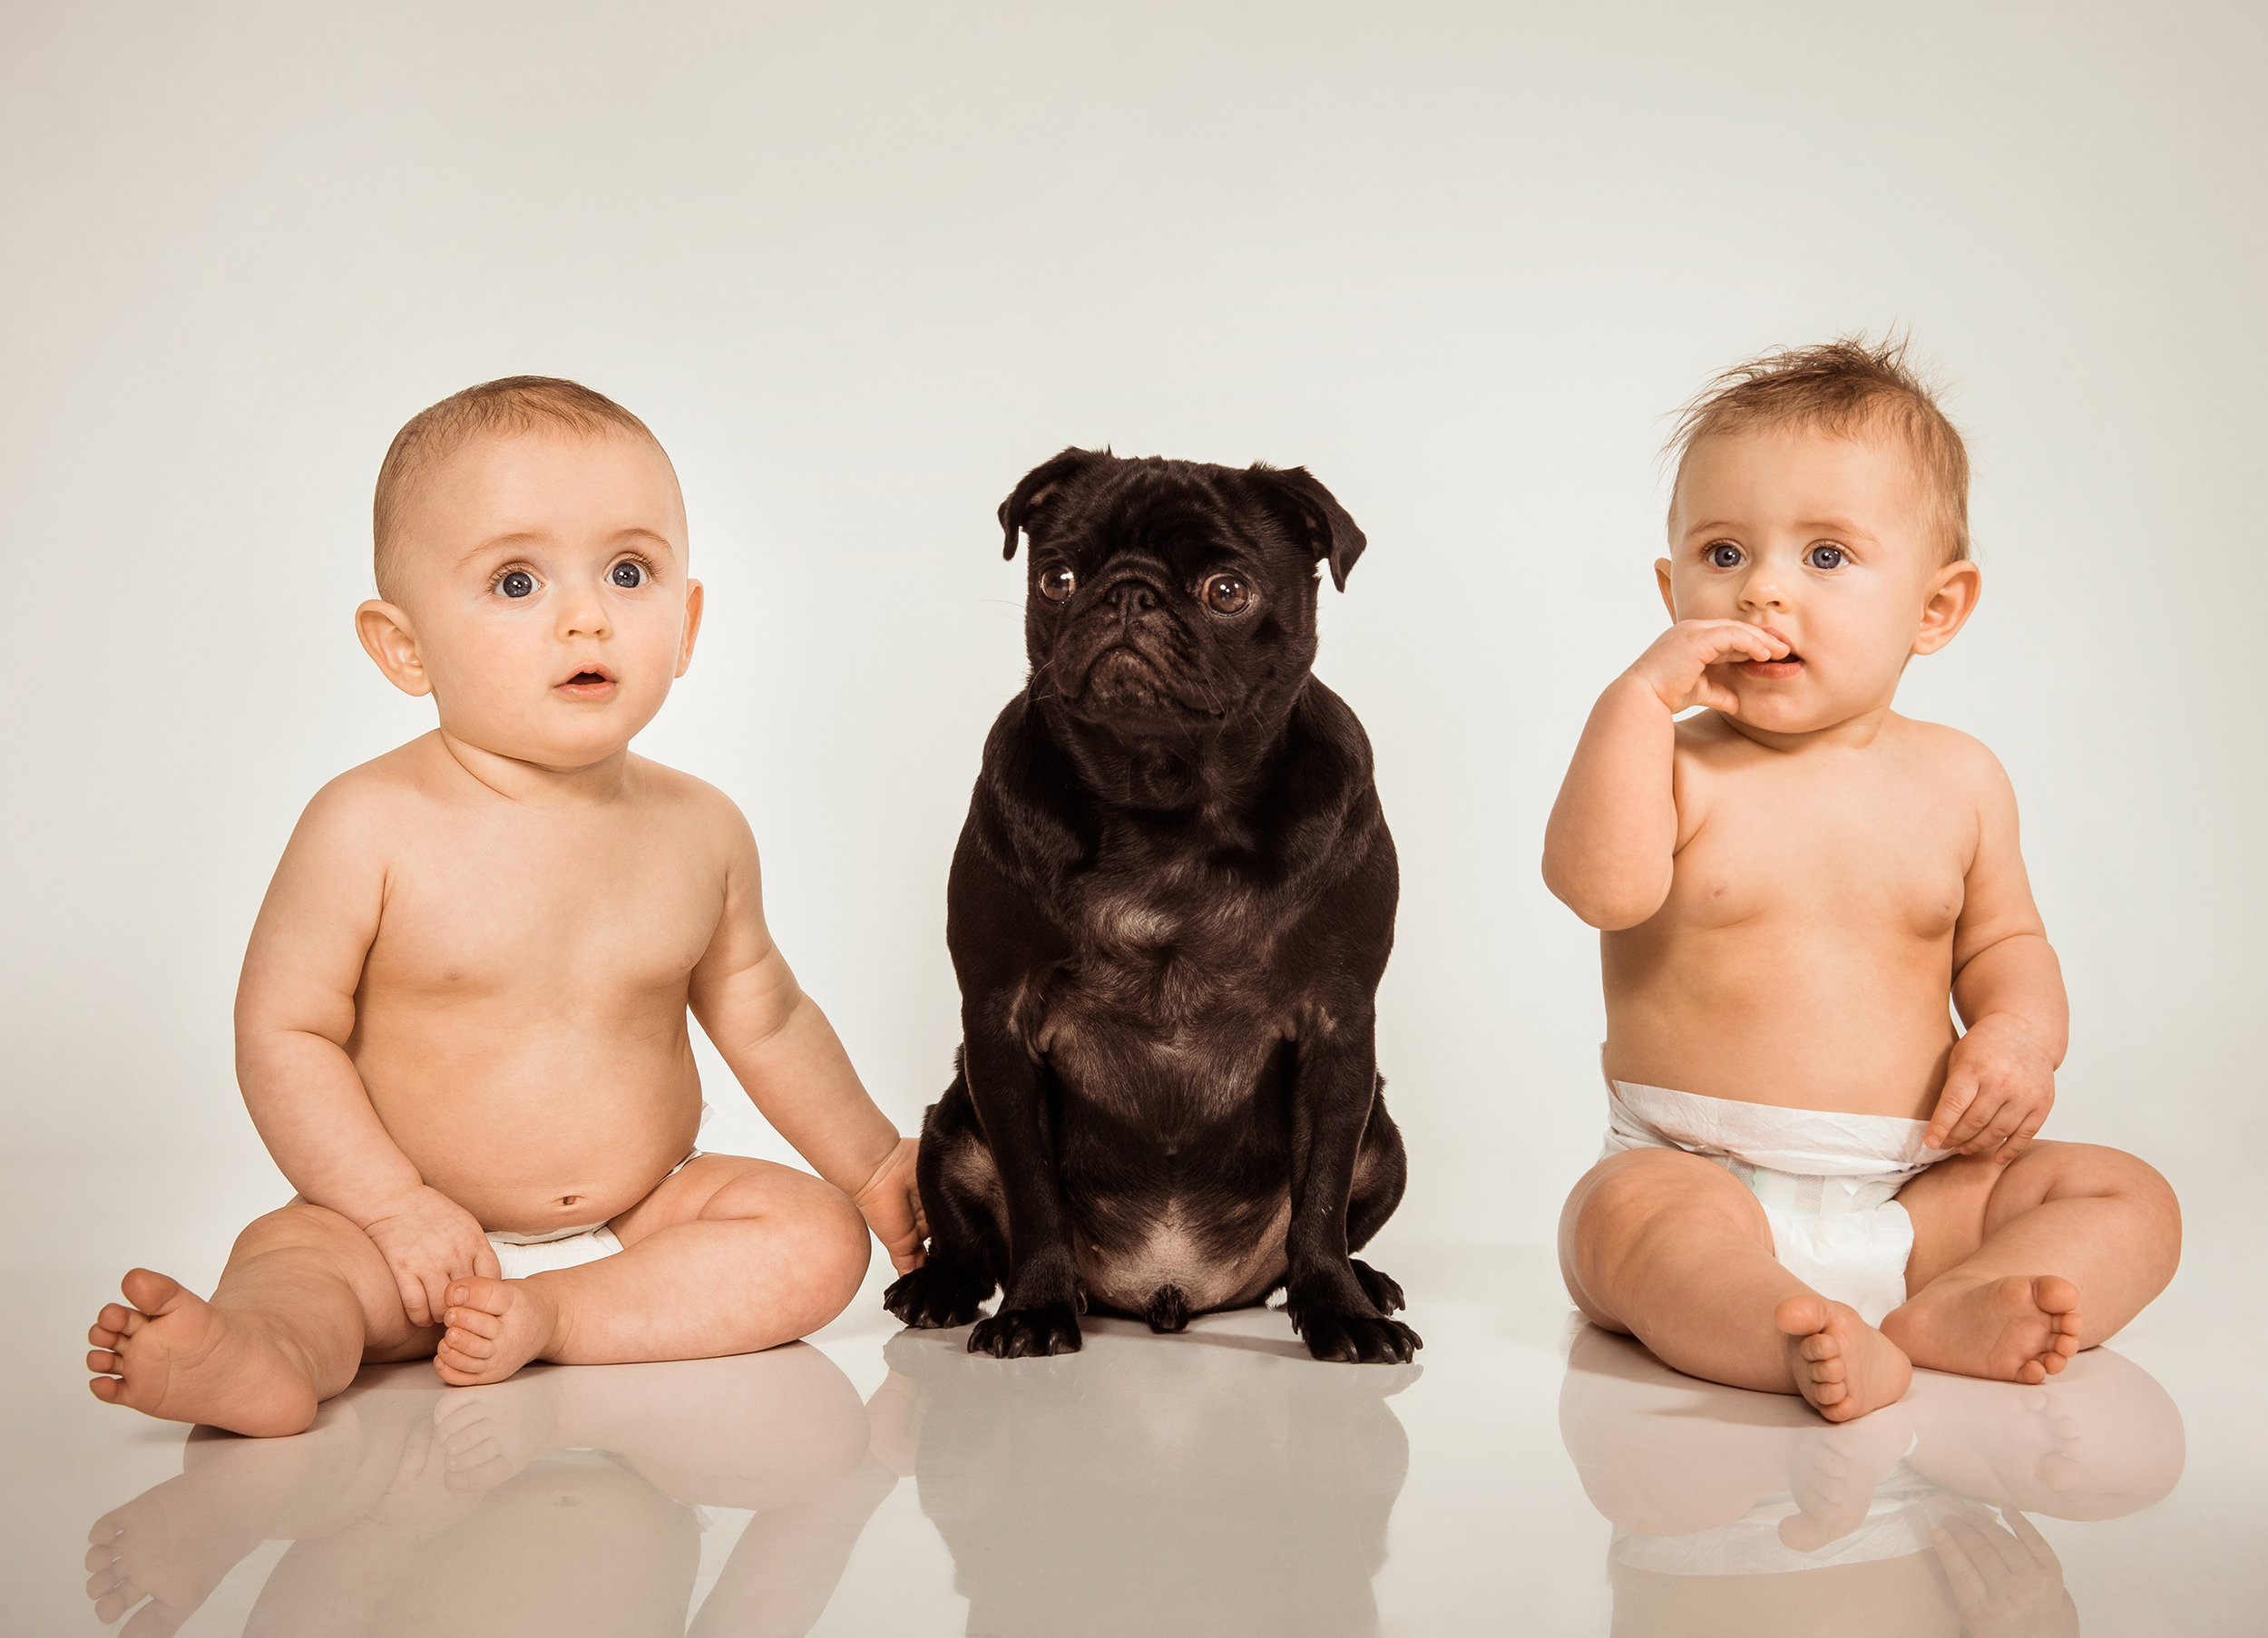 kinderfoto-mit-hund.jpg